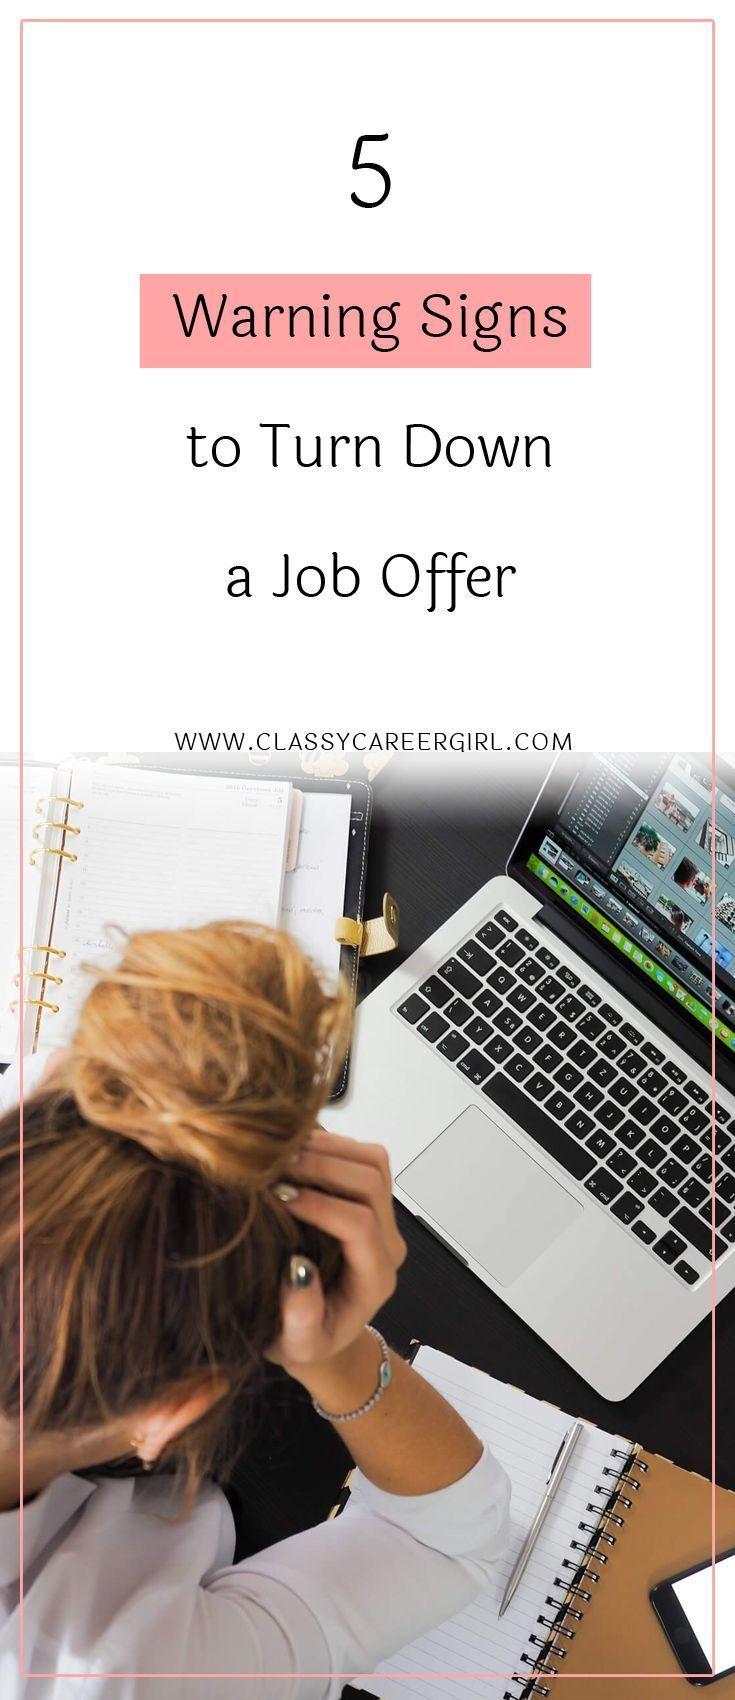 Best 25+ Job offer ideas on Pinterest